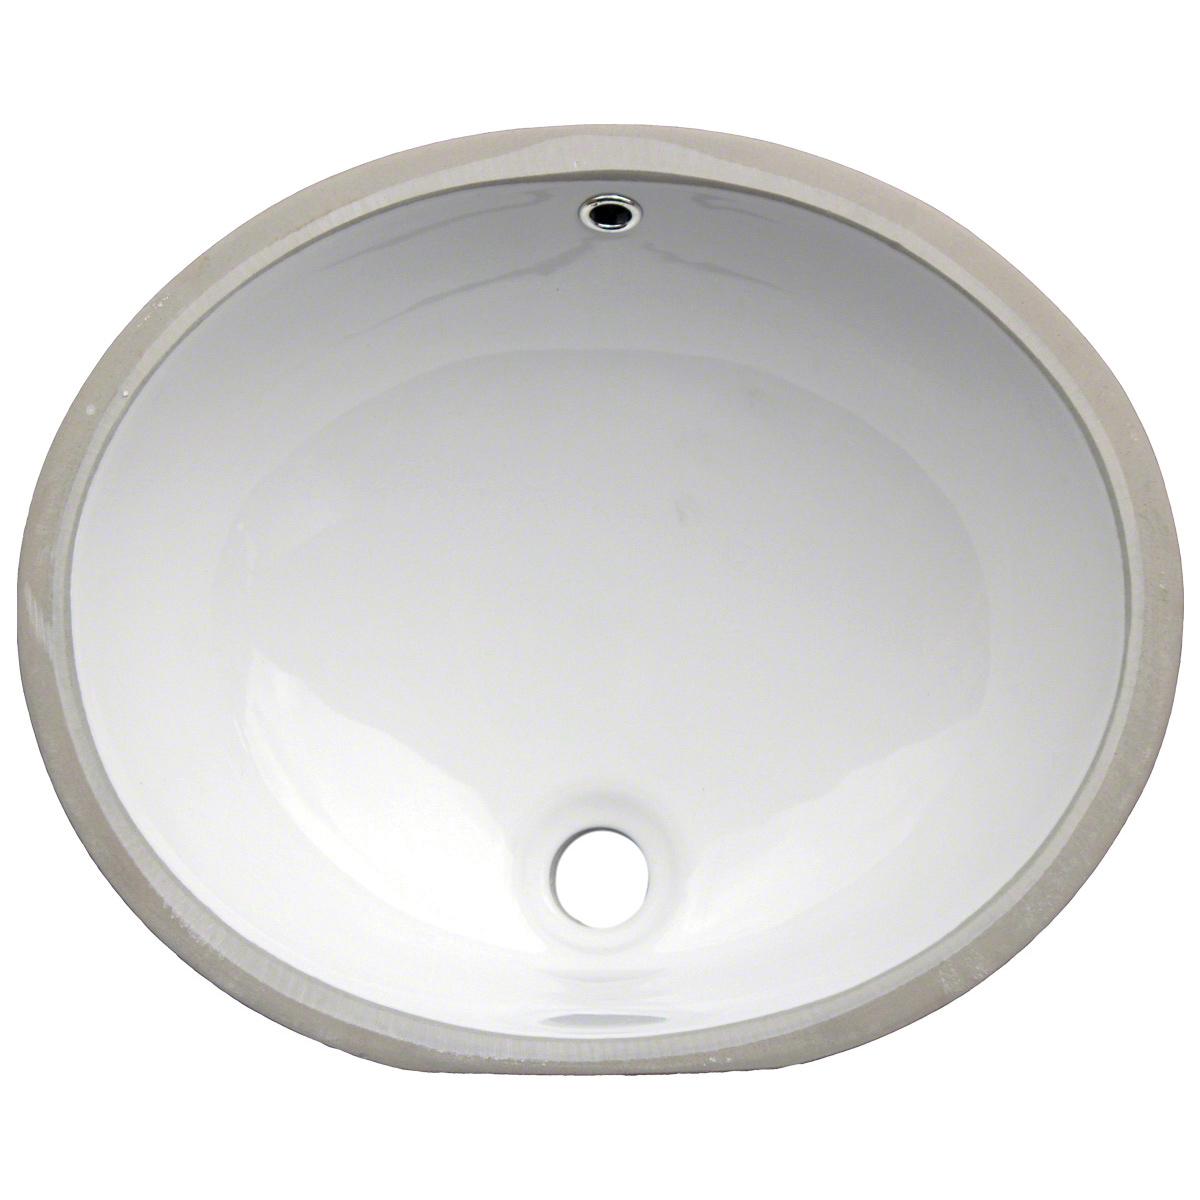 Sinks -porcelain-vanity-oval-white-1512-SIN-POR-UNDOVLWHT-1512